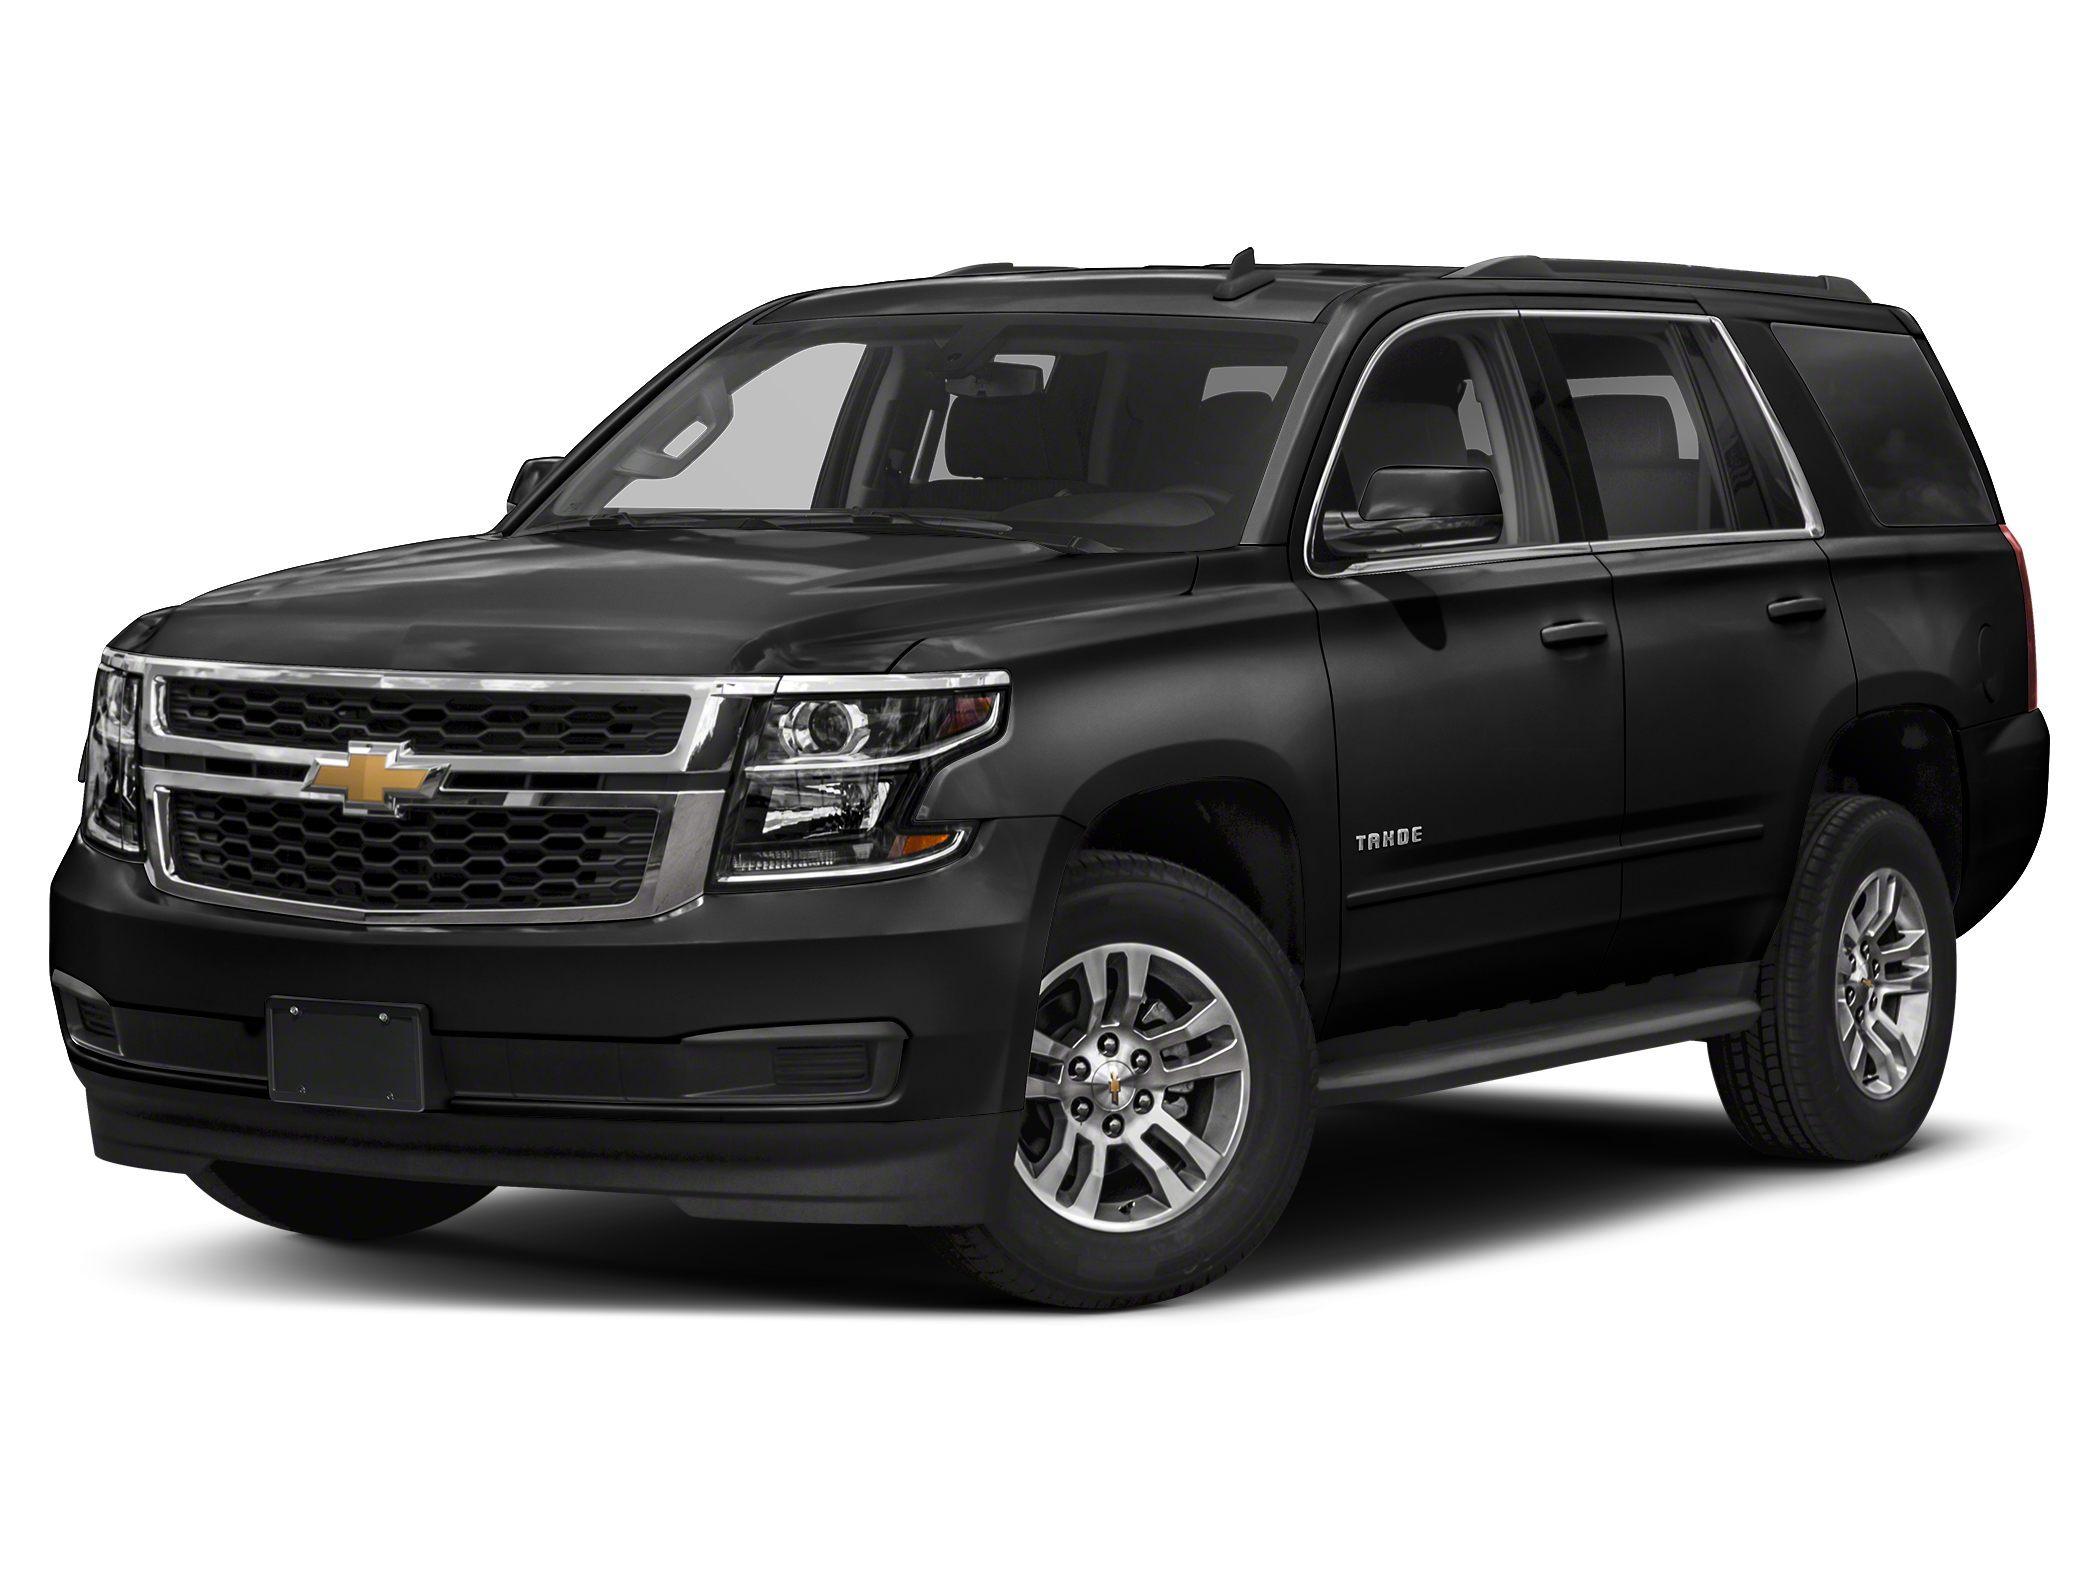 2019 Chevrolet Tahoe SUV